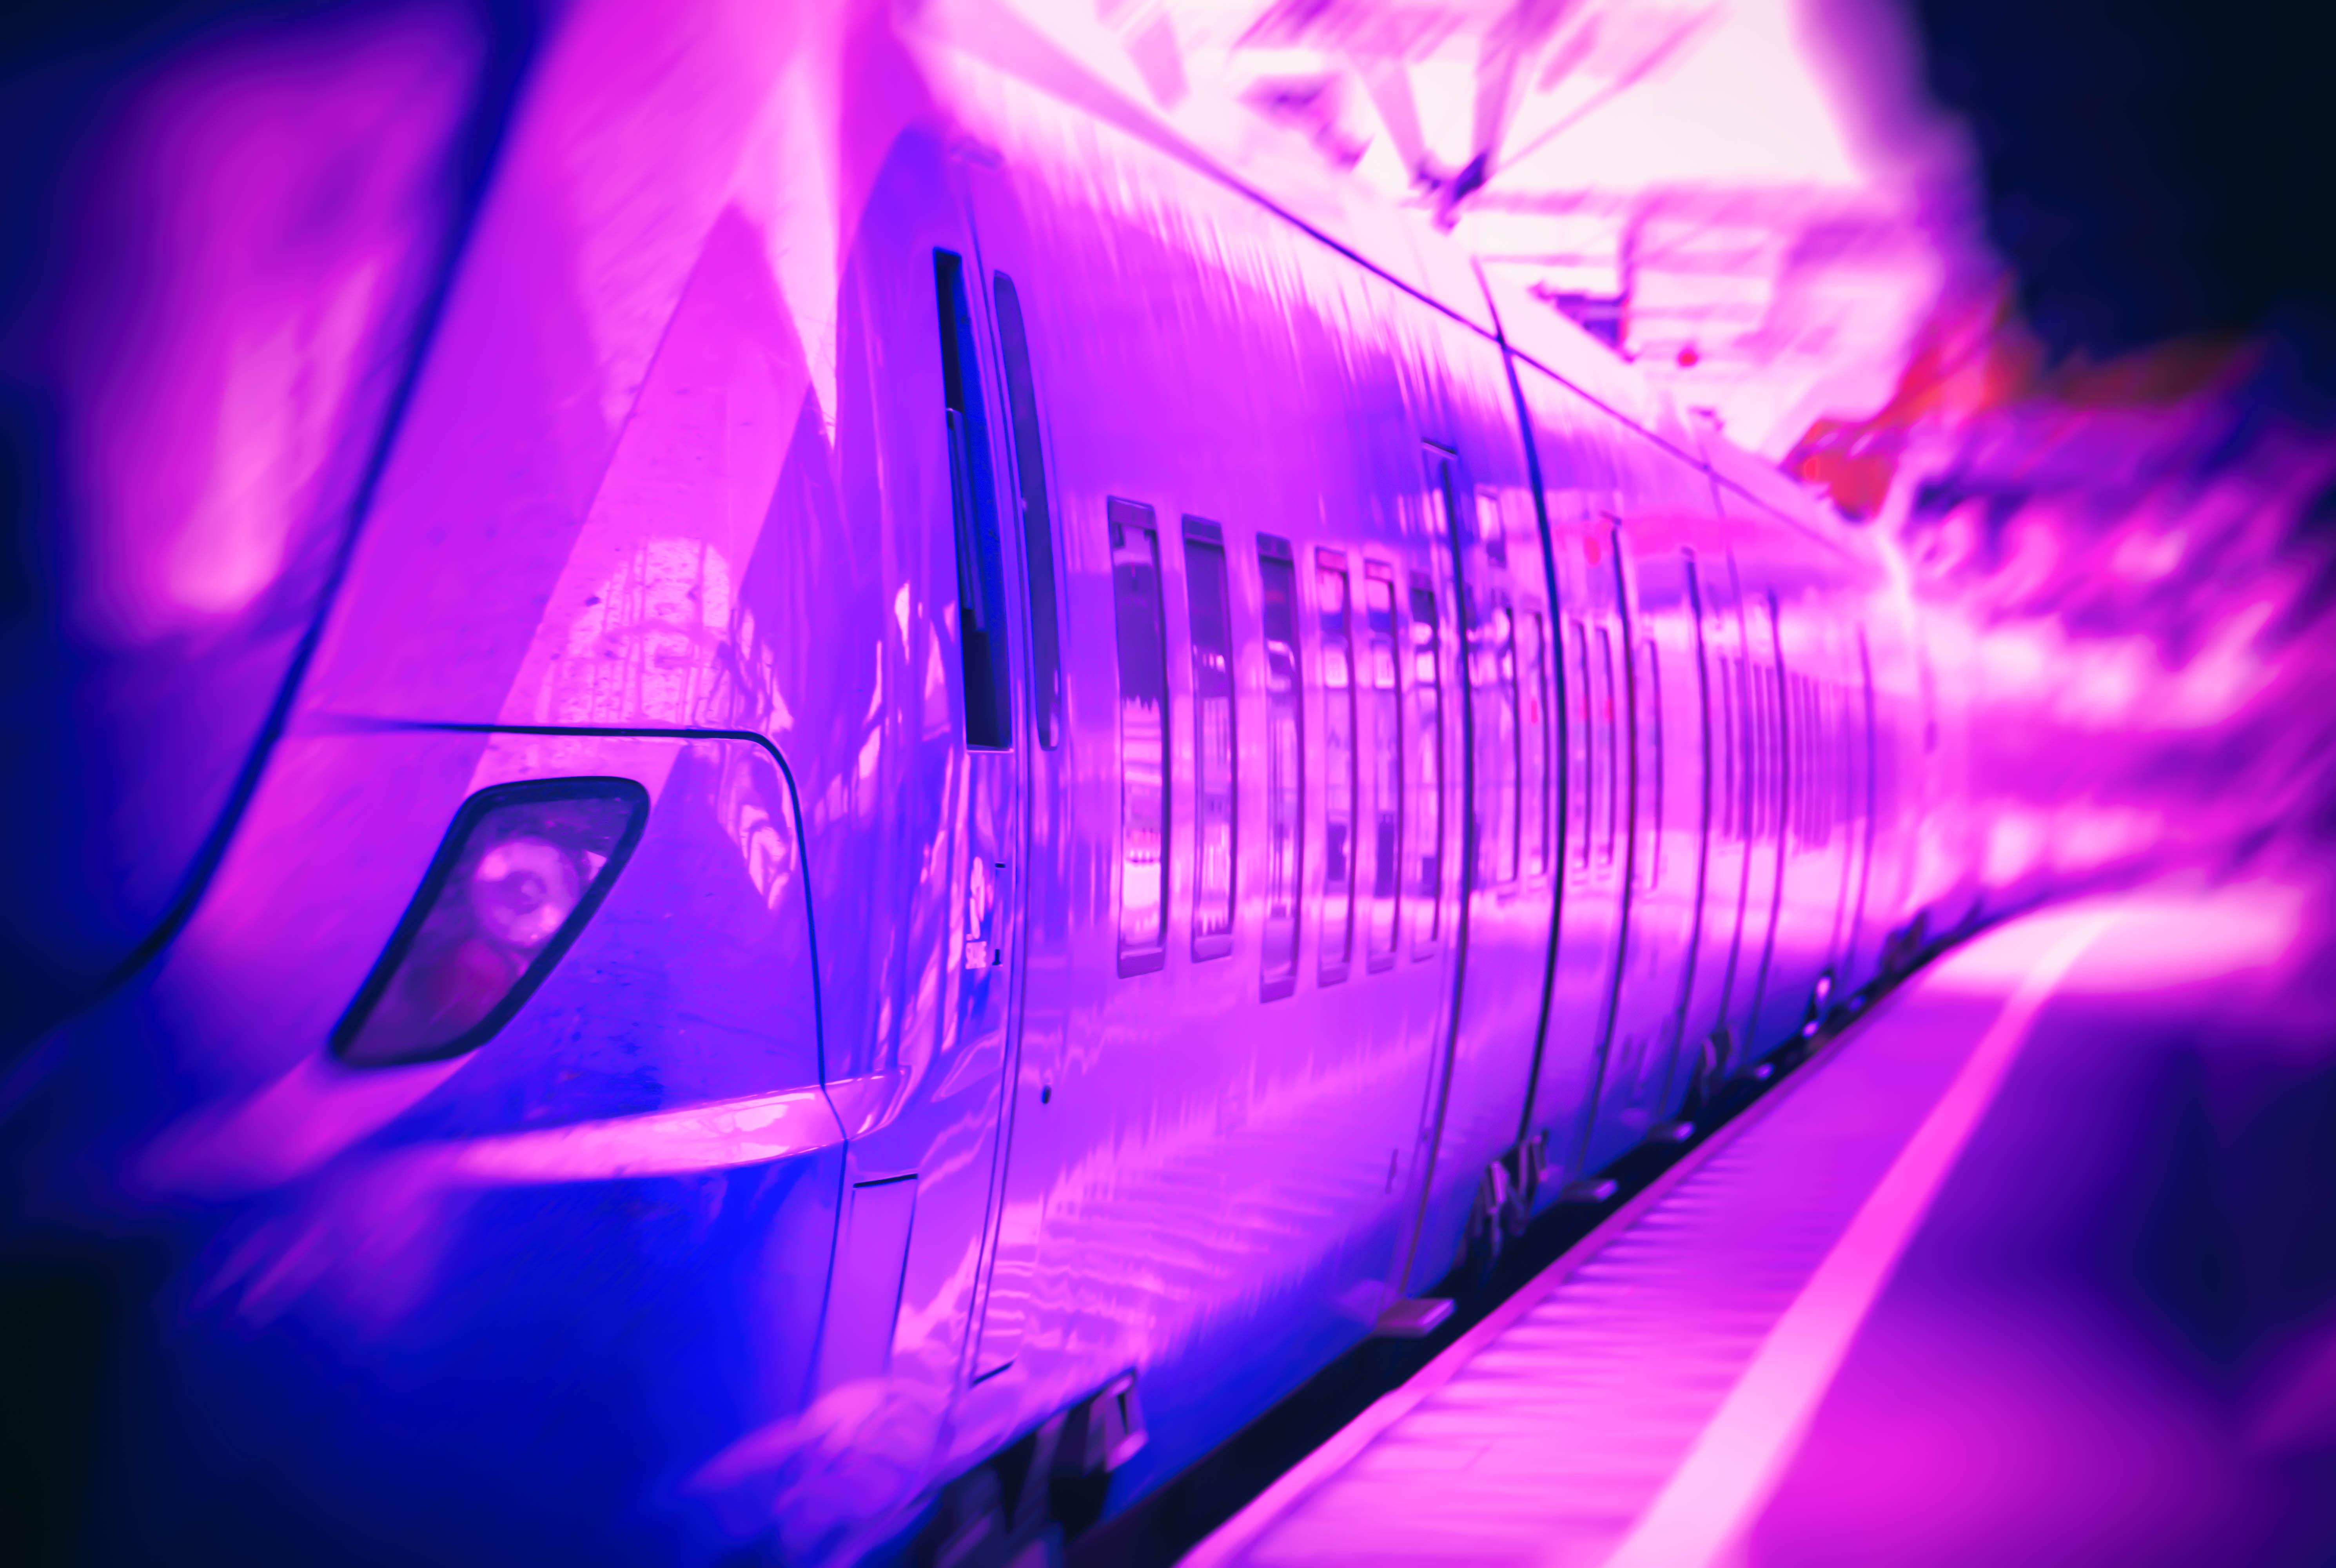 Wallpaper Sunlight City Night Reflection Purple Train Blue Electricity Sverige Light Color Depthoffield Dof Blur Sk Nel N Se Fotosondag